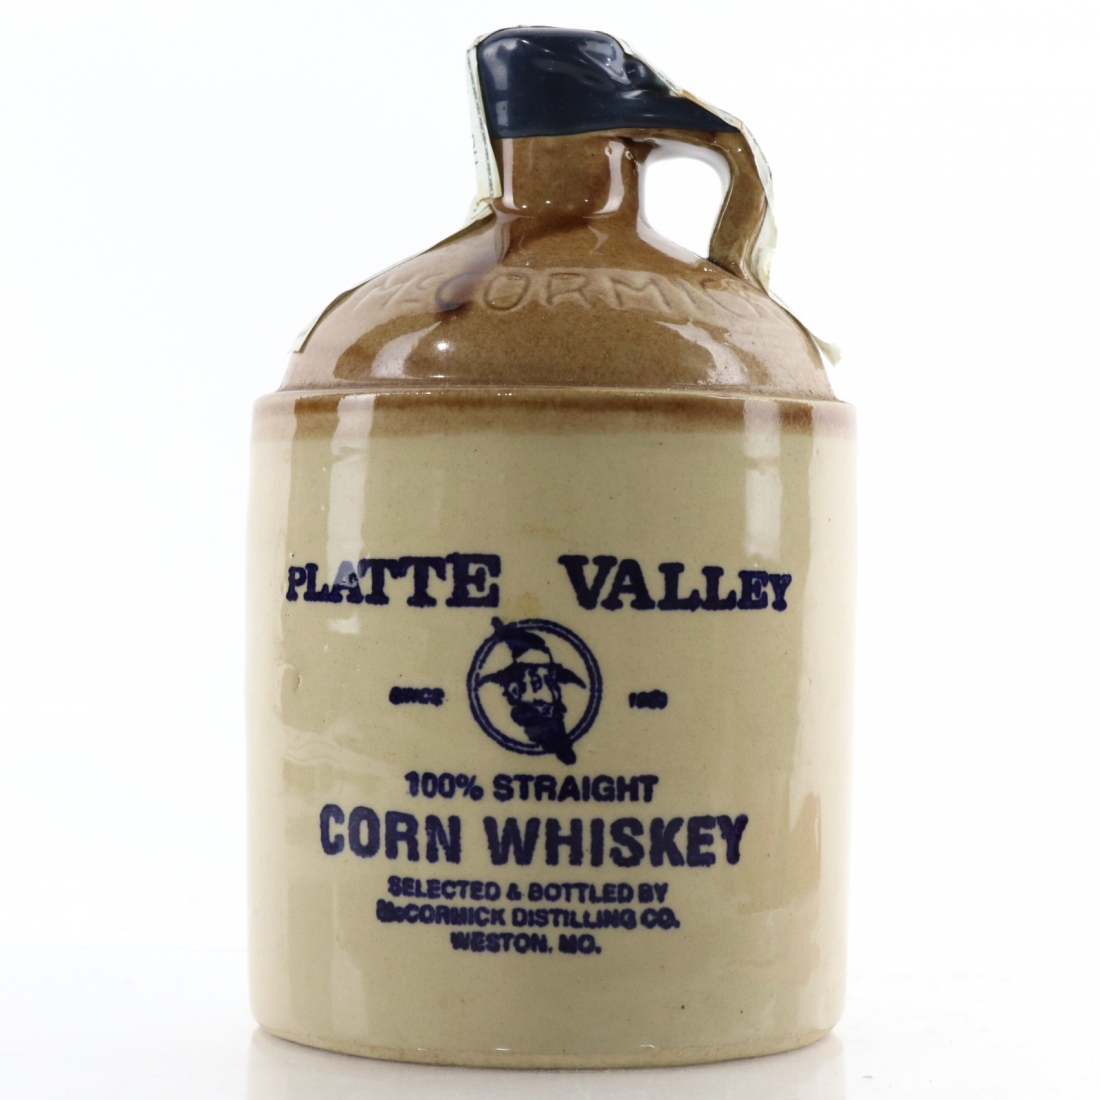 Platte Valley 100% Straight Corn Whiskey Decanter